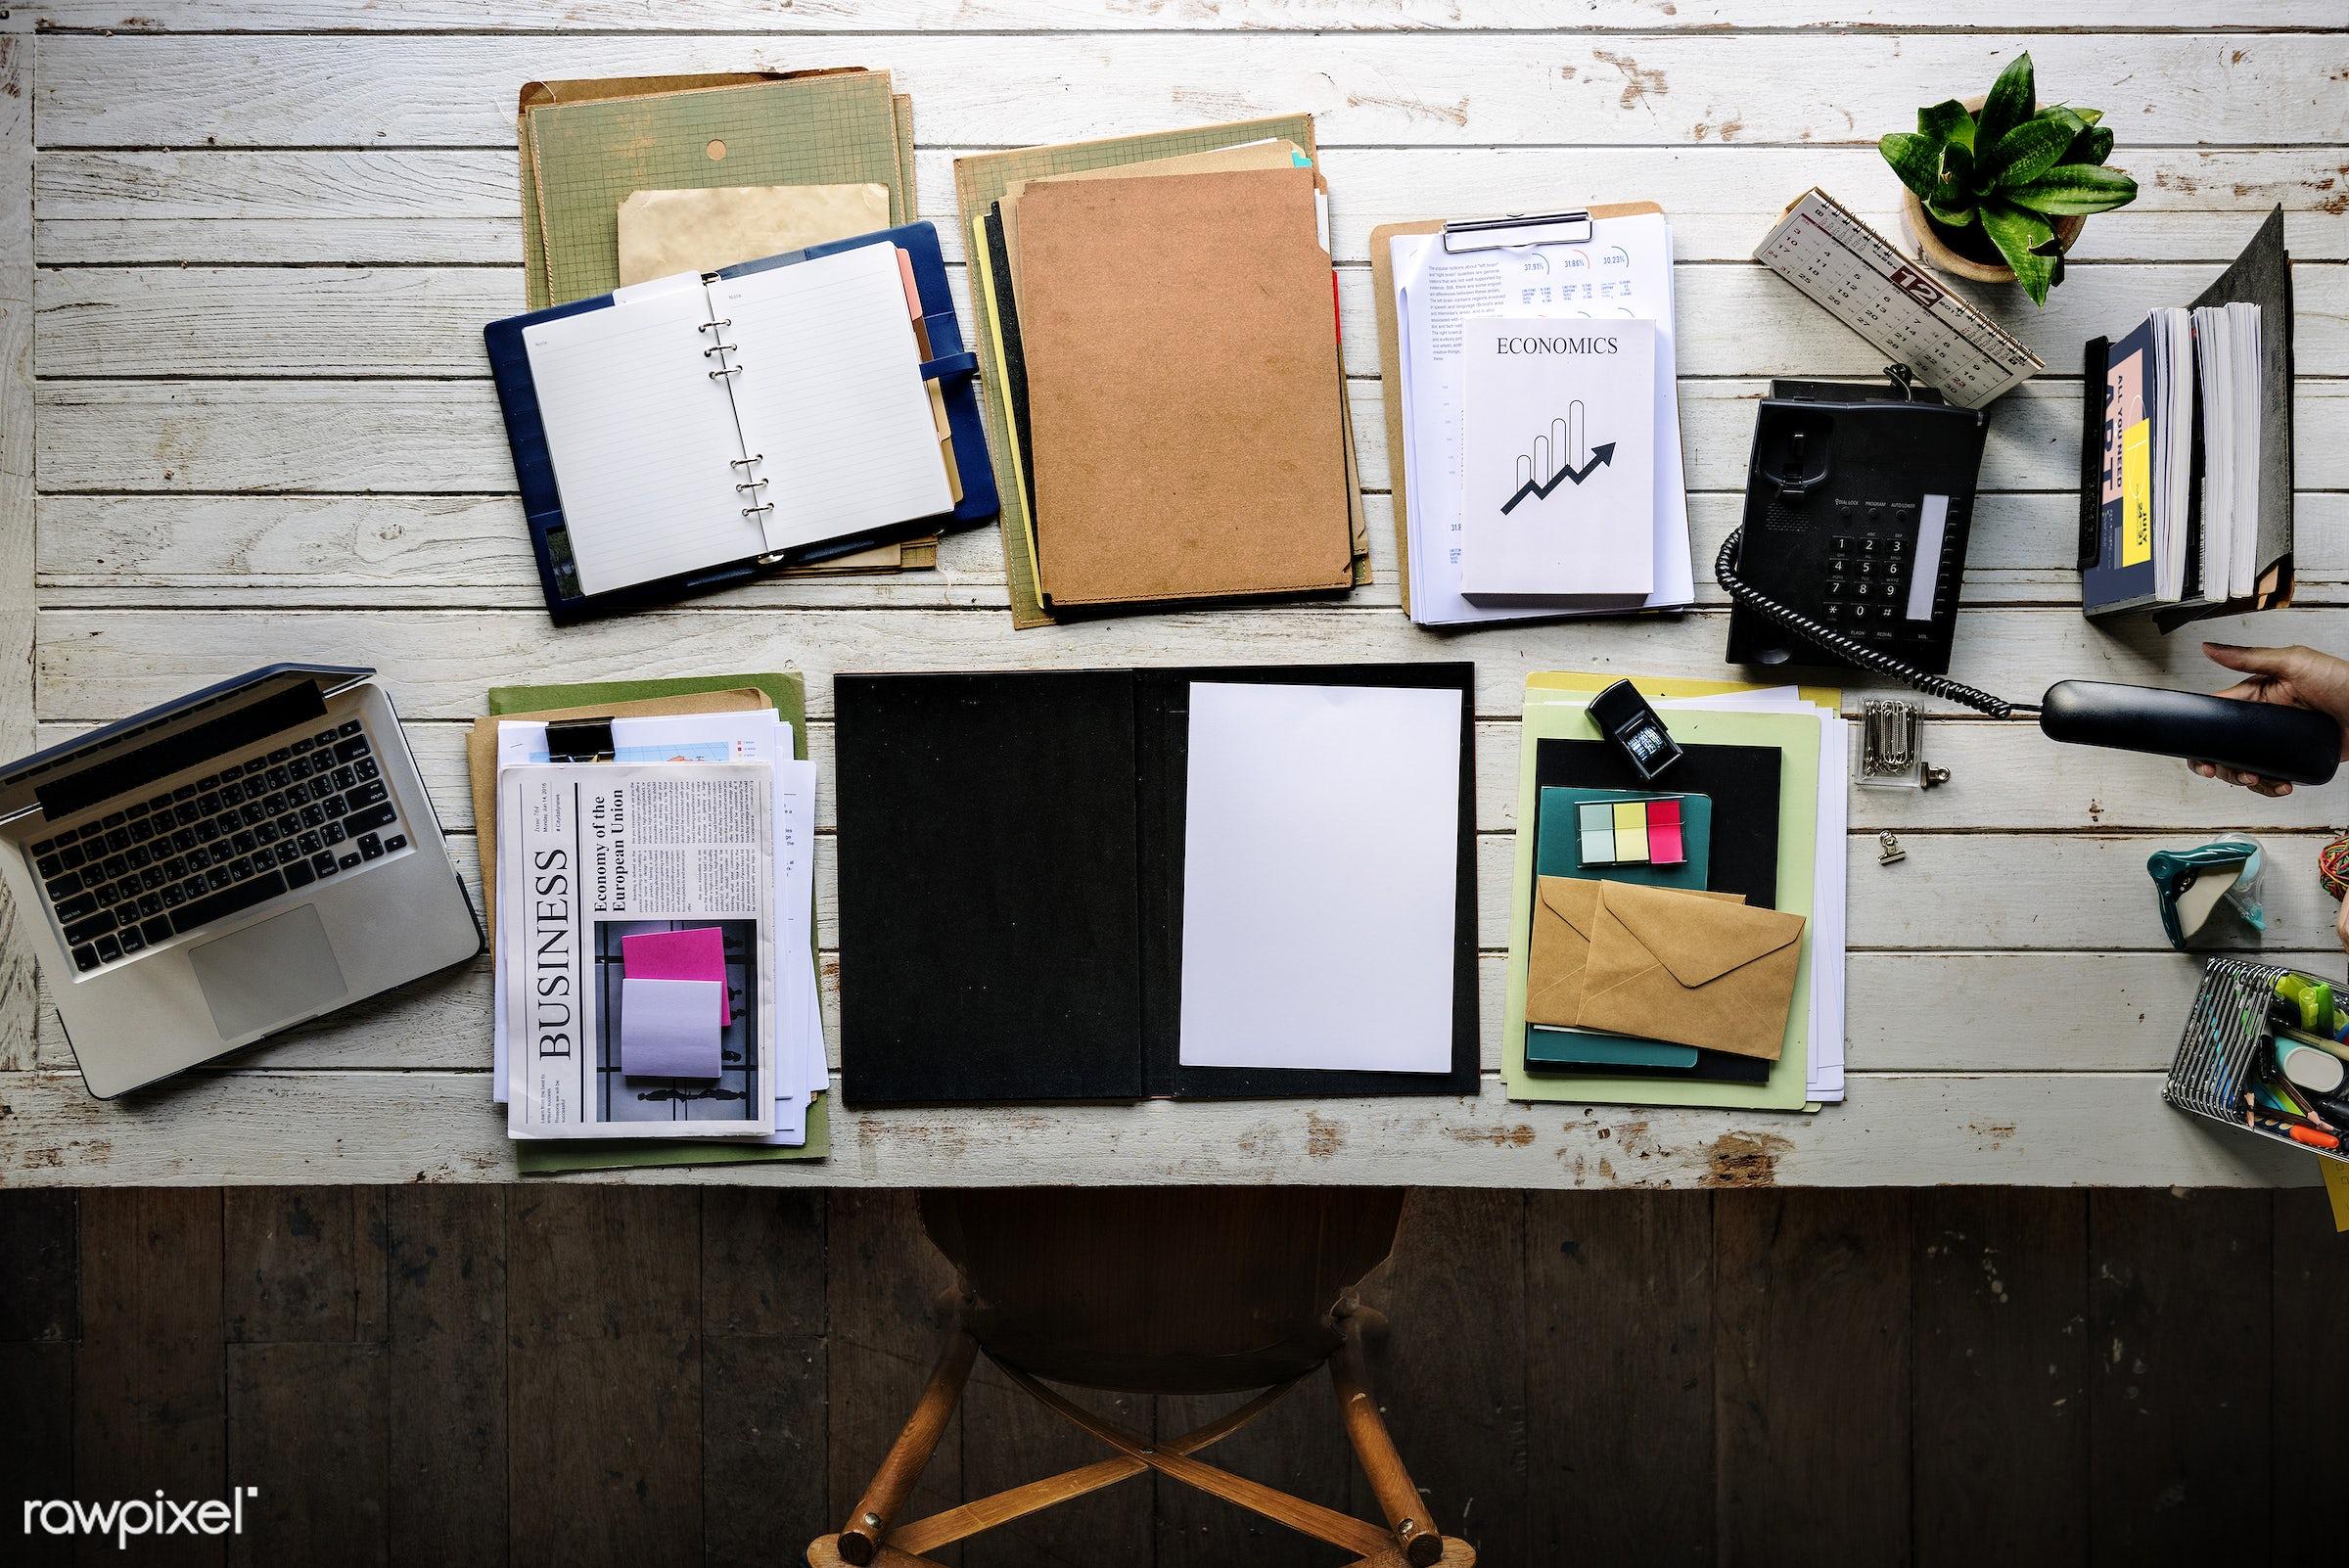 development, paper, motivation, workplace, purpose, corporation, business, commercial, information, objective, vision, news...